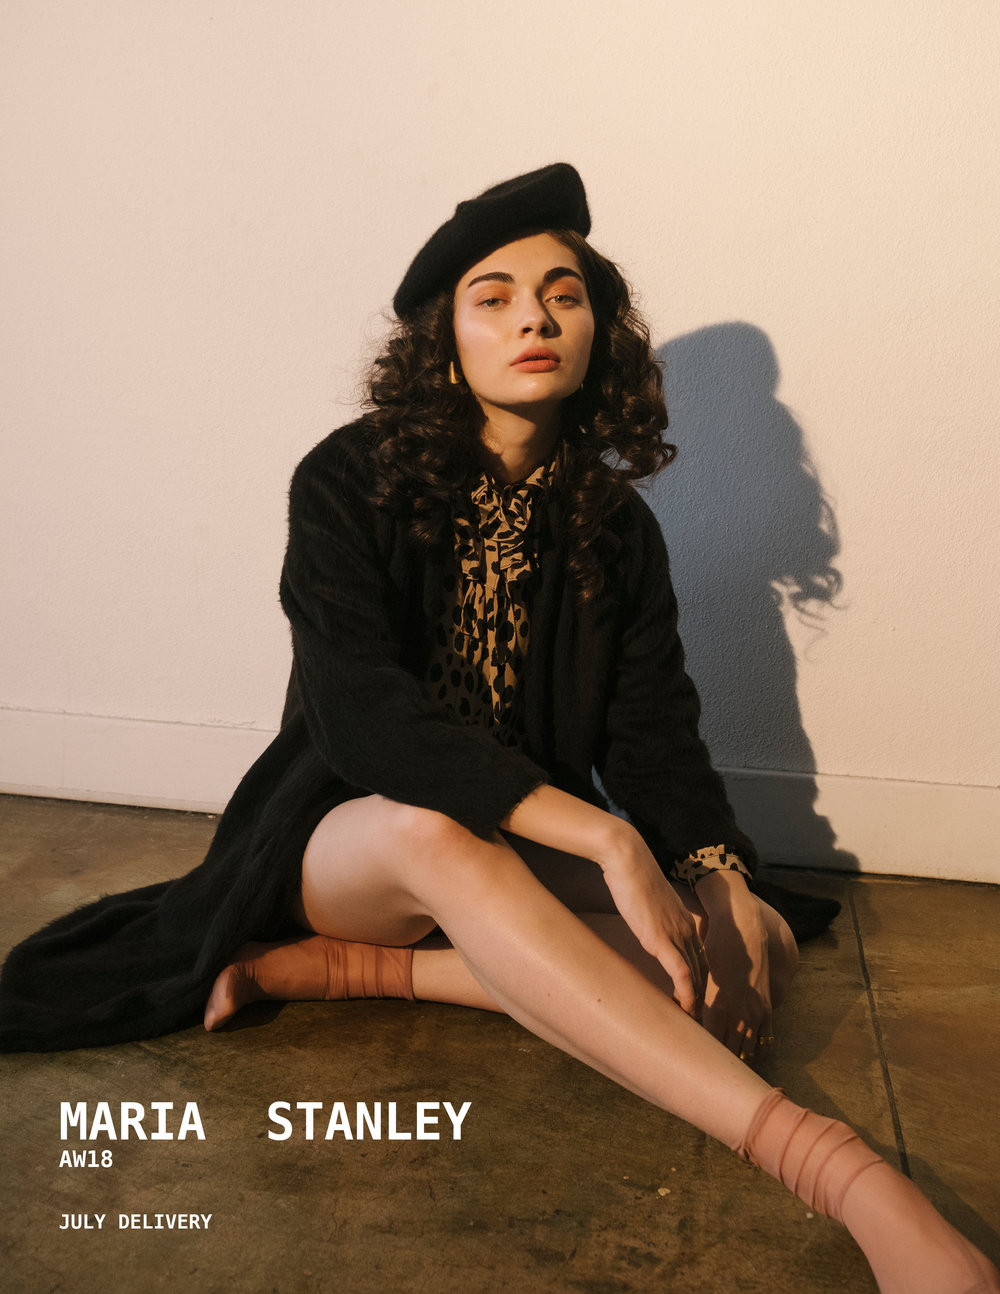 Maria Stanley AW18 Line Sheets - PRINT.jpg